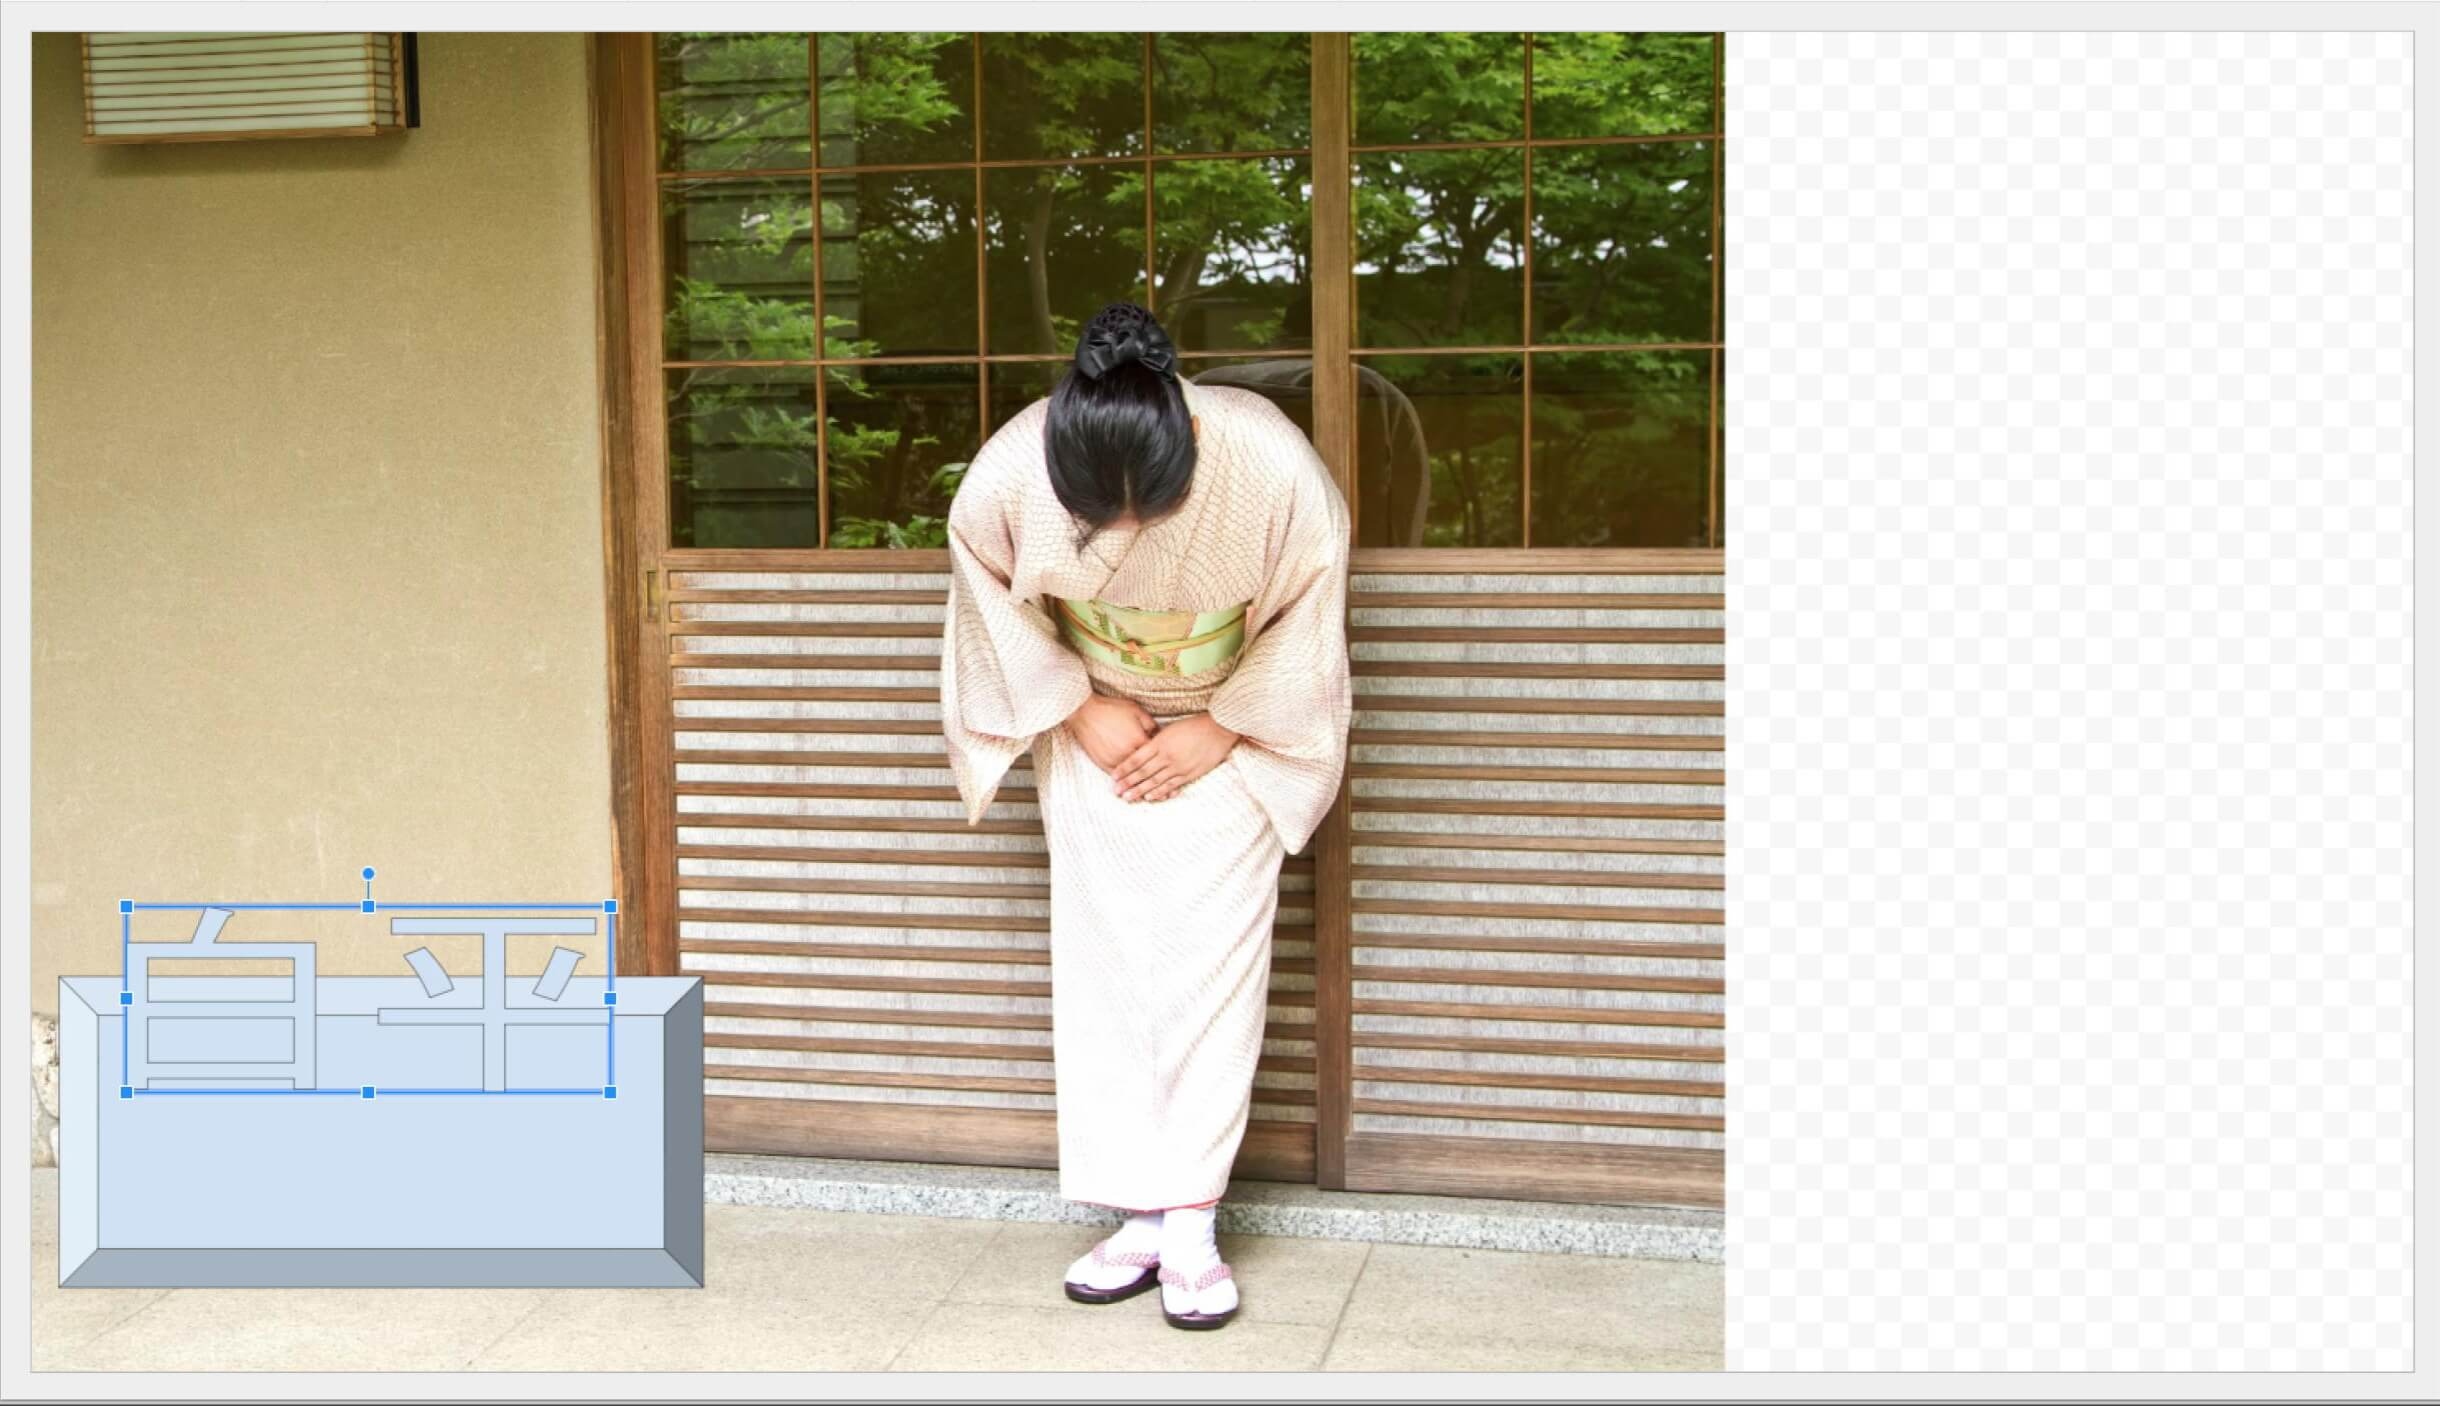 Google図形描画 玄関先で出迎える女将とベベルと前に出た白平